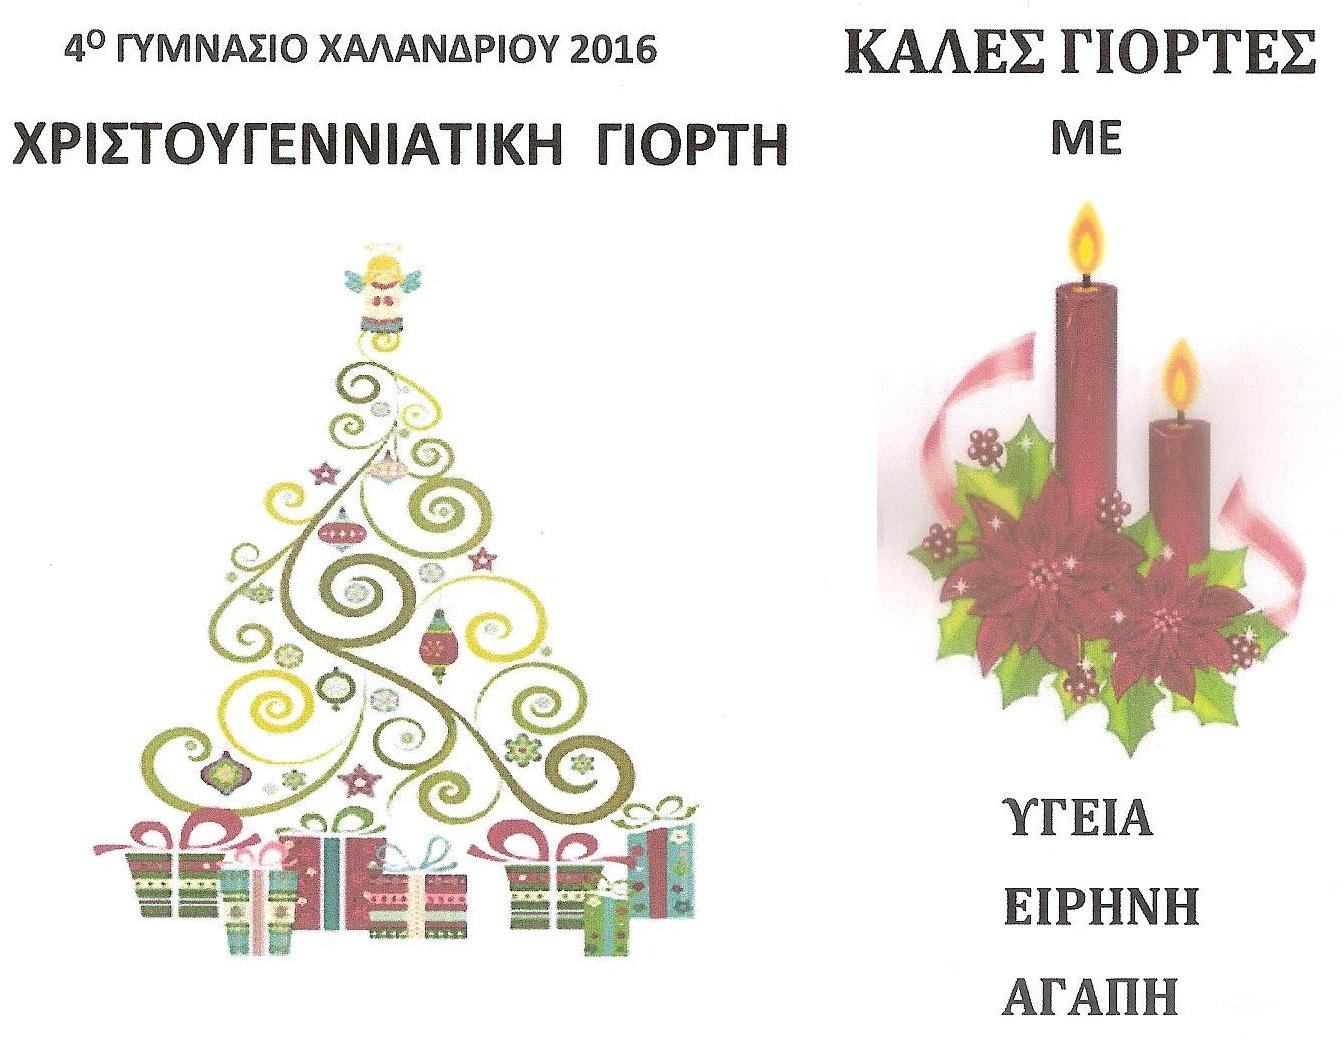 23-12-2016 003